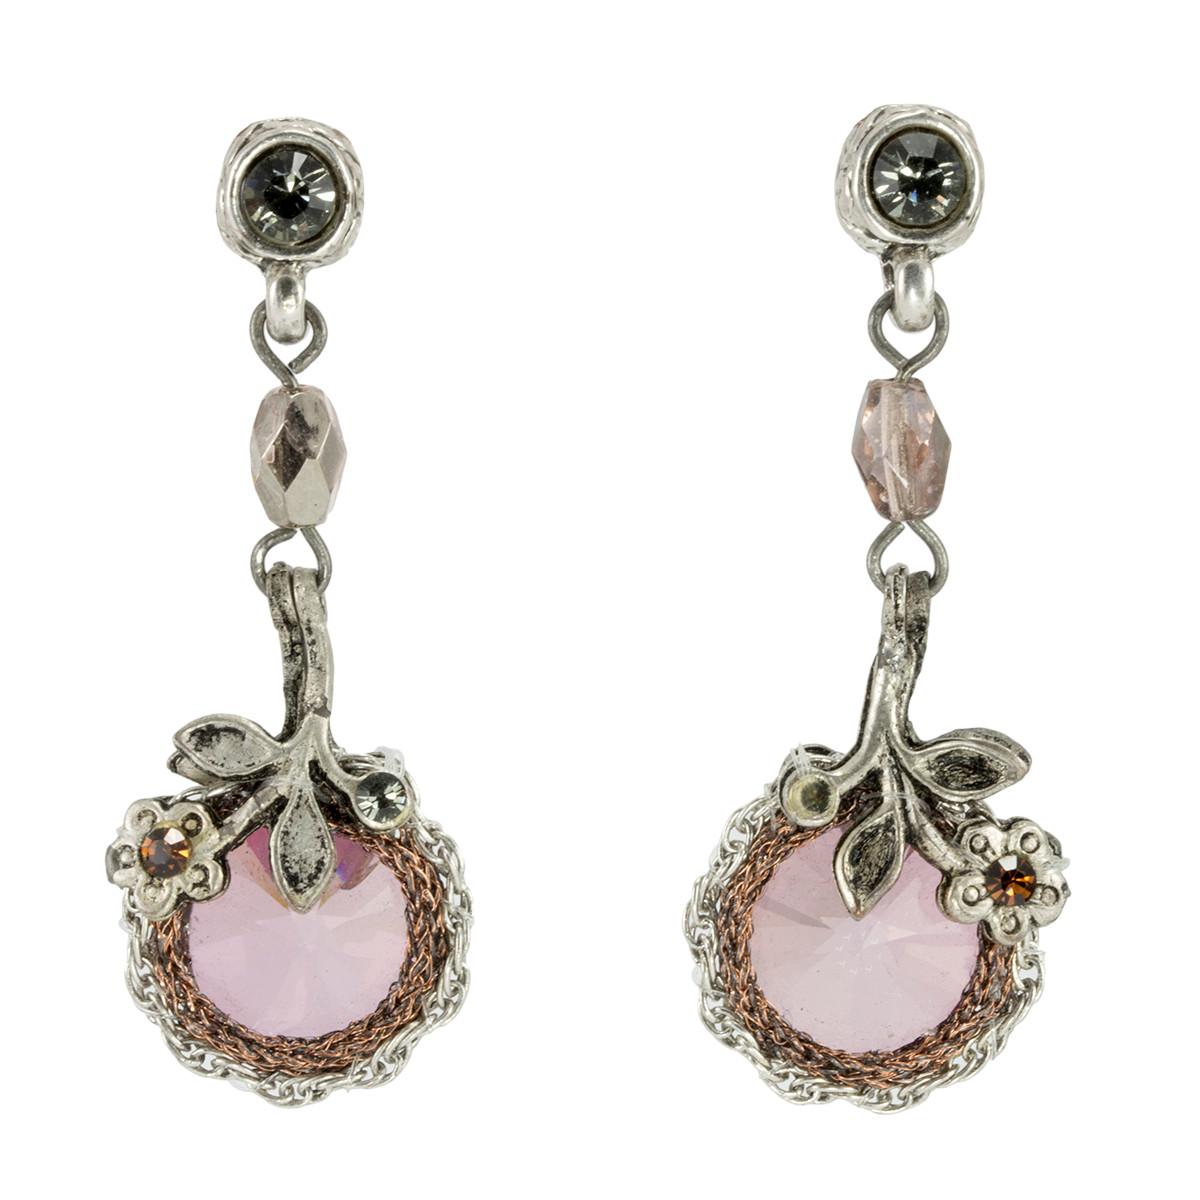 Anat Collection Earrings Antique Pink Nouveau Glam